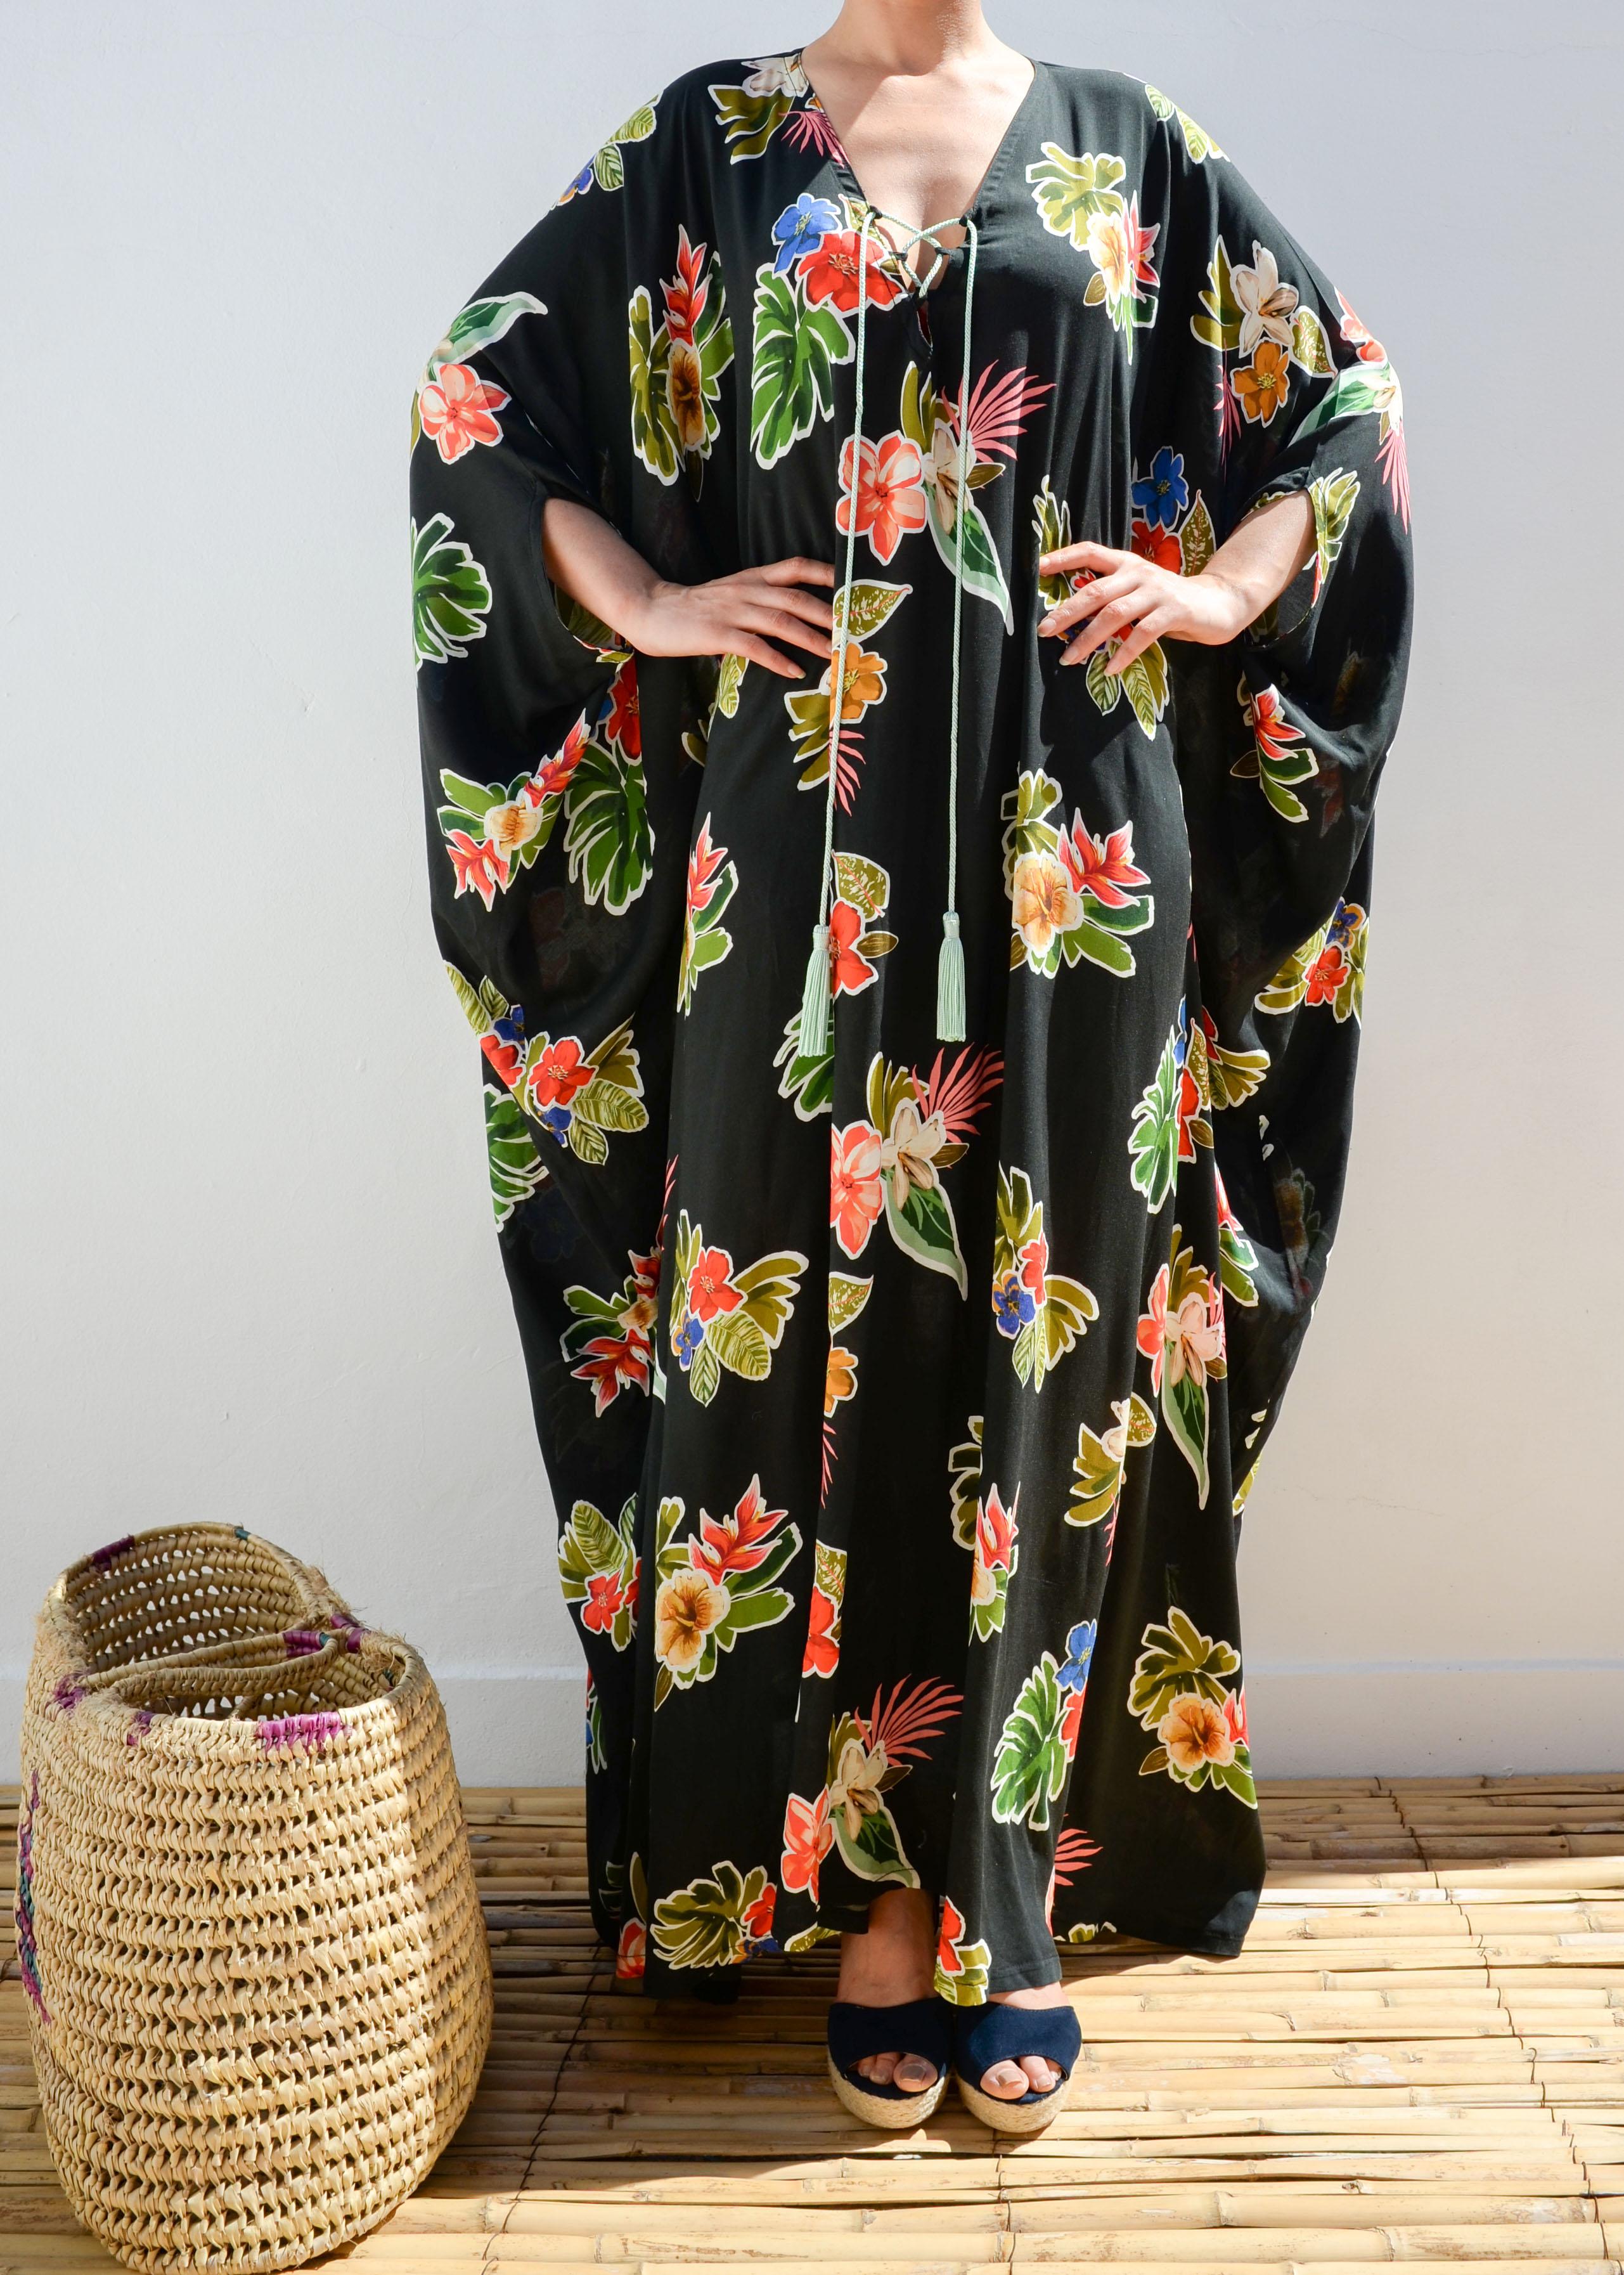 eac9405ba9ae Moroccan kaftan maxi summer dress floral dress resortwear 2017 ...